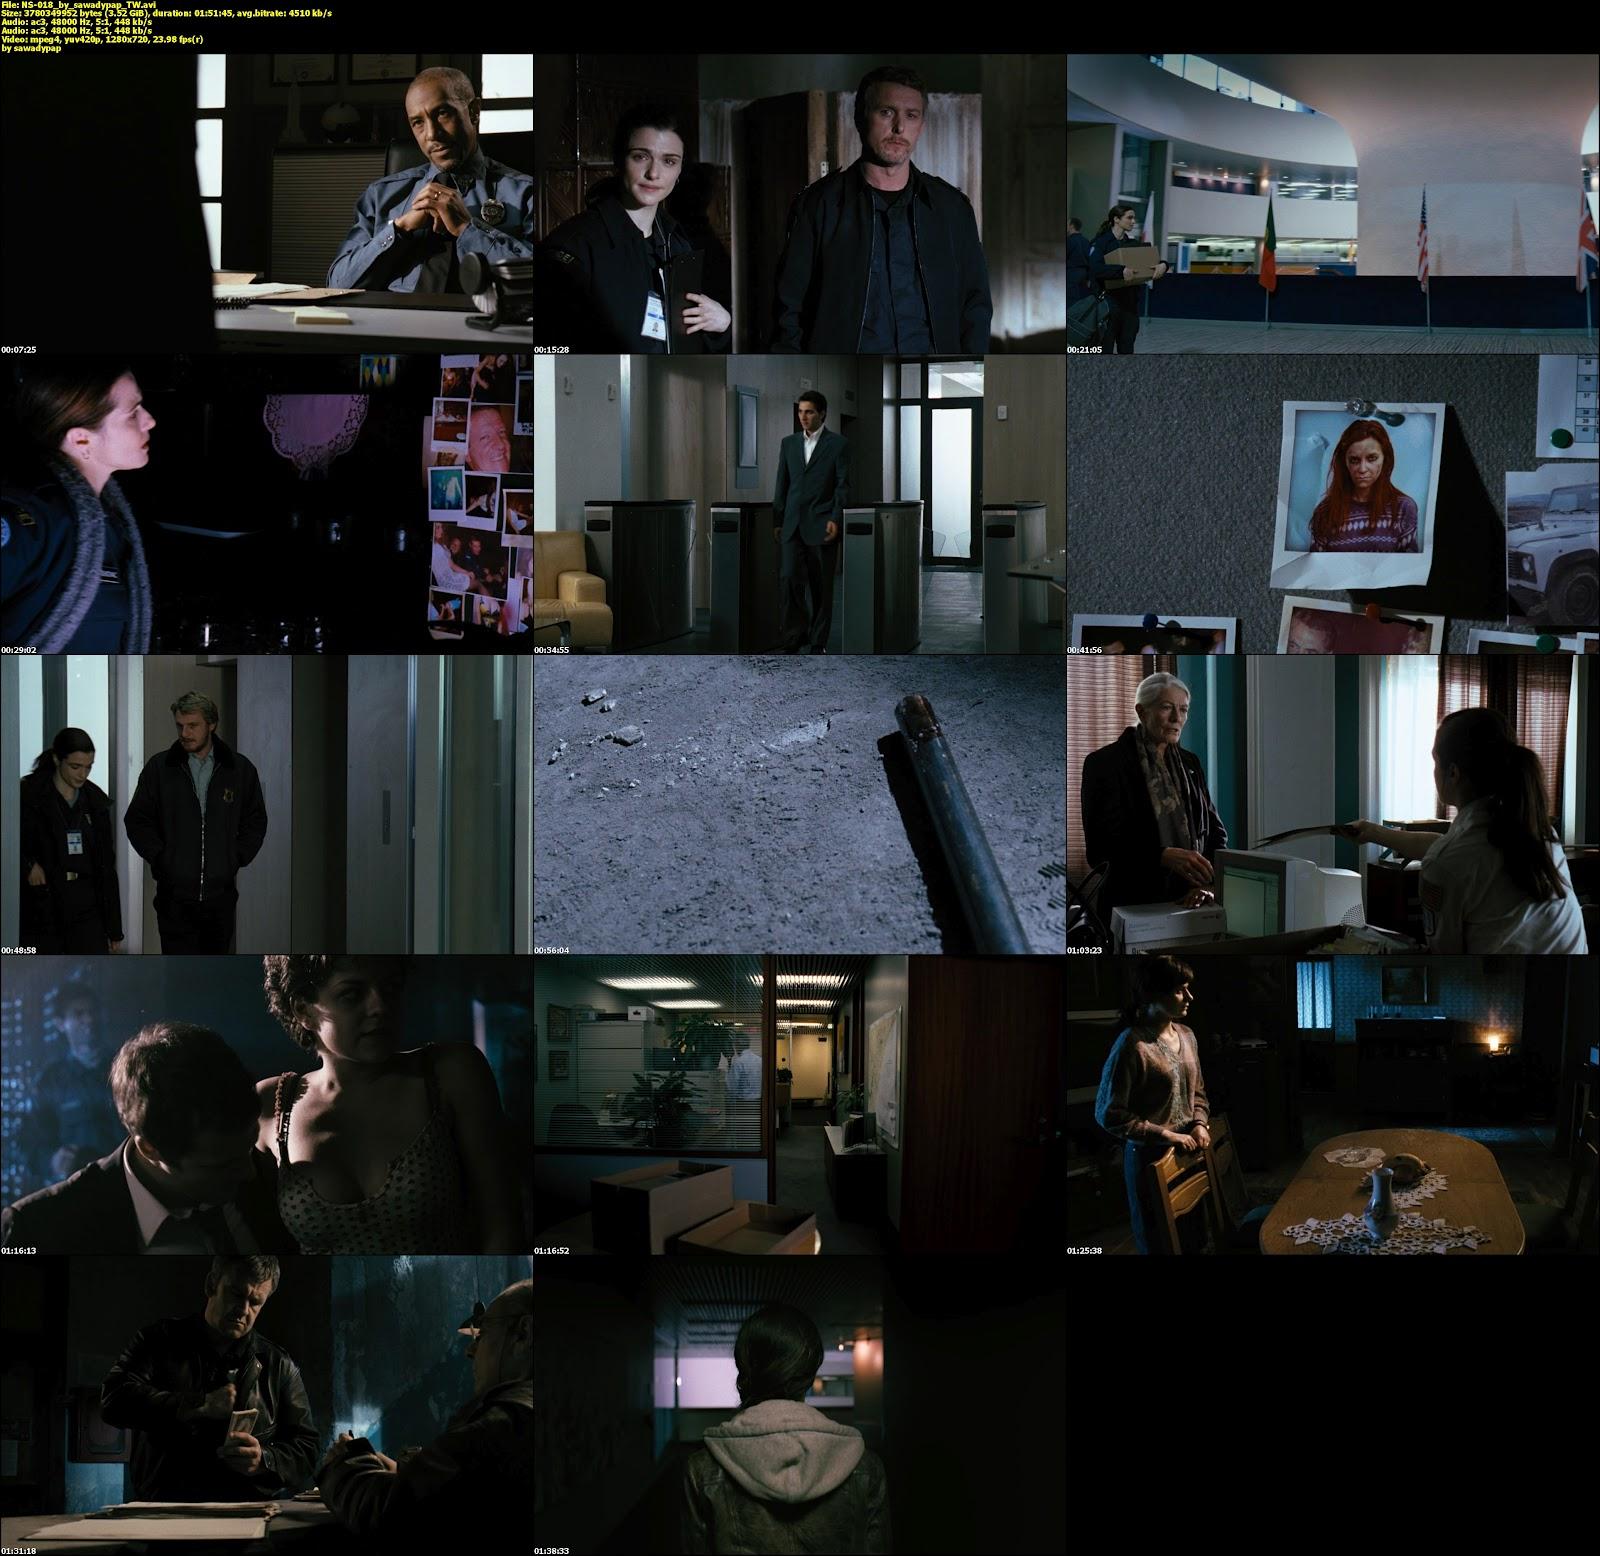 The Whistleblower(La Verdad Oculta) [2010][HDRip 720p] [Dual